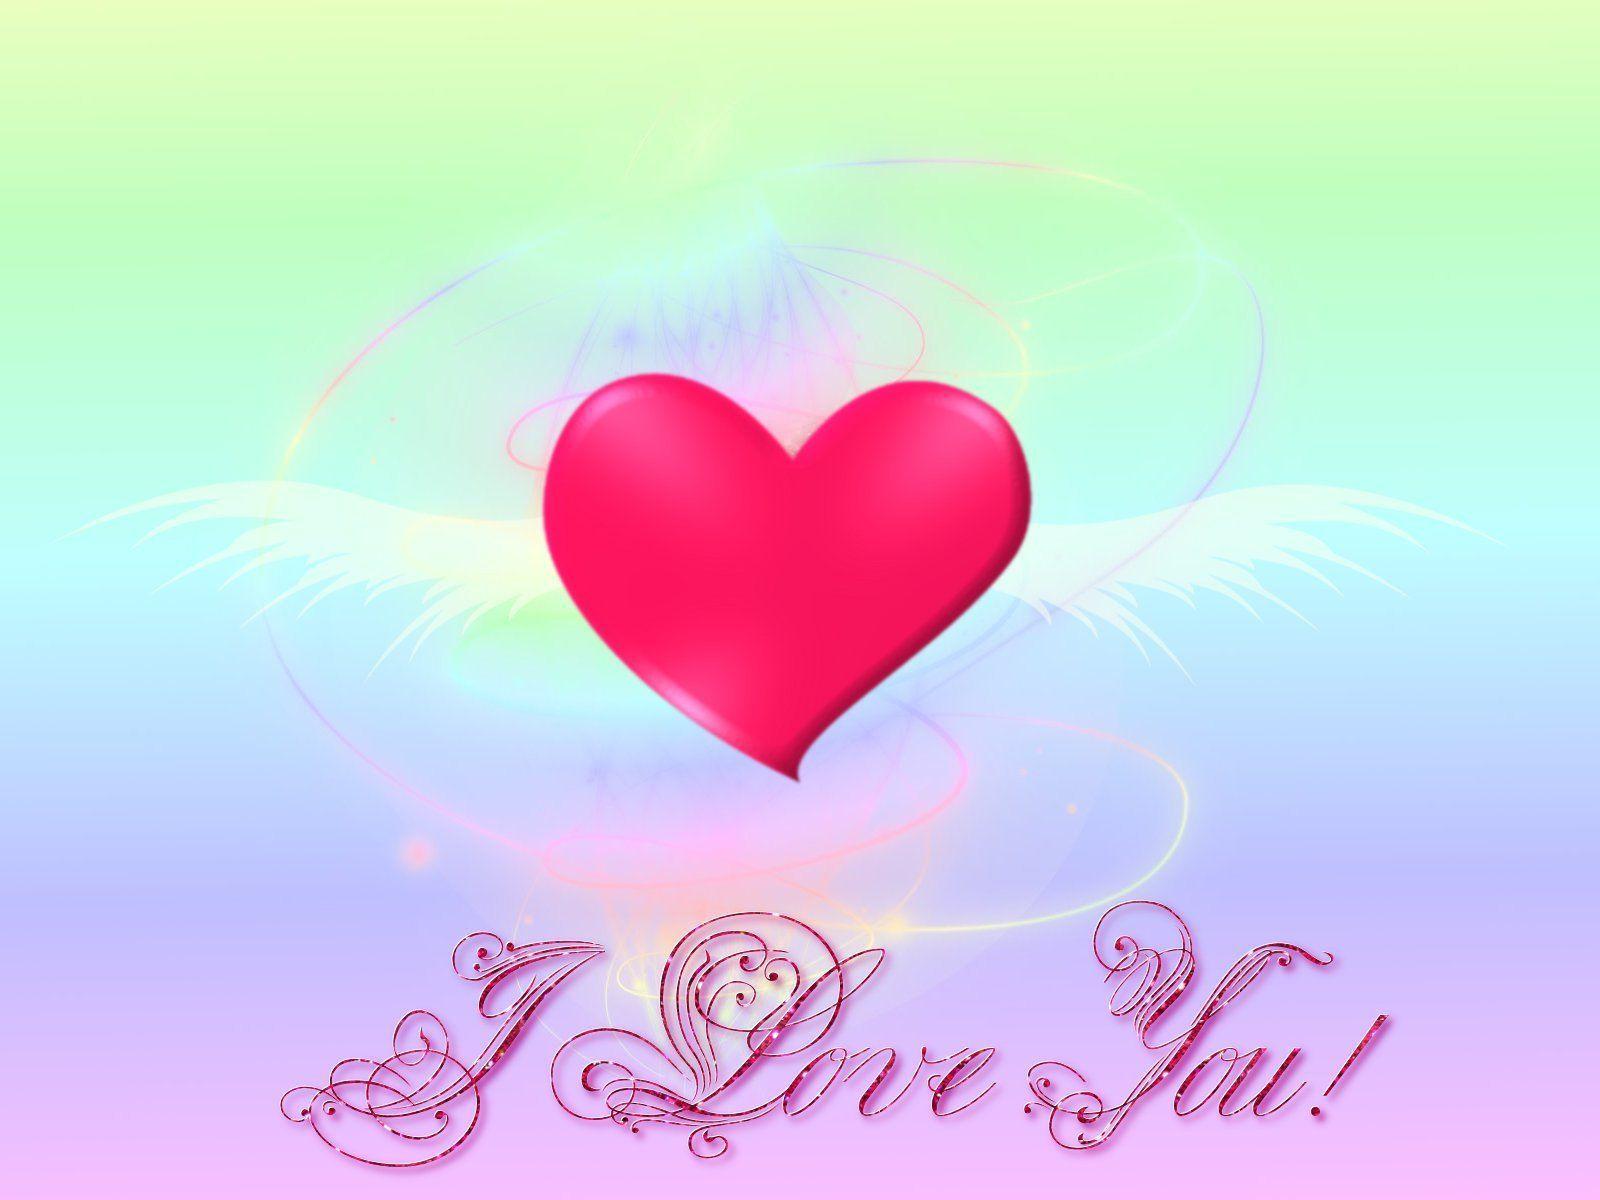 Wallpaper download love you - I Love You Cute Wallpaper Wallpaper Download